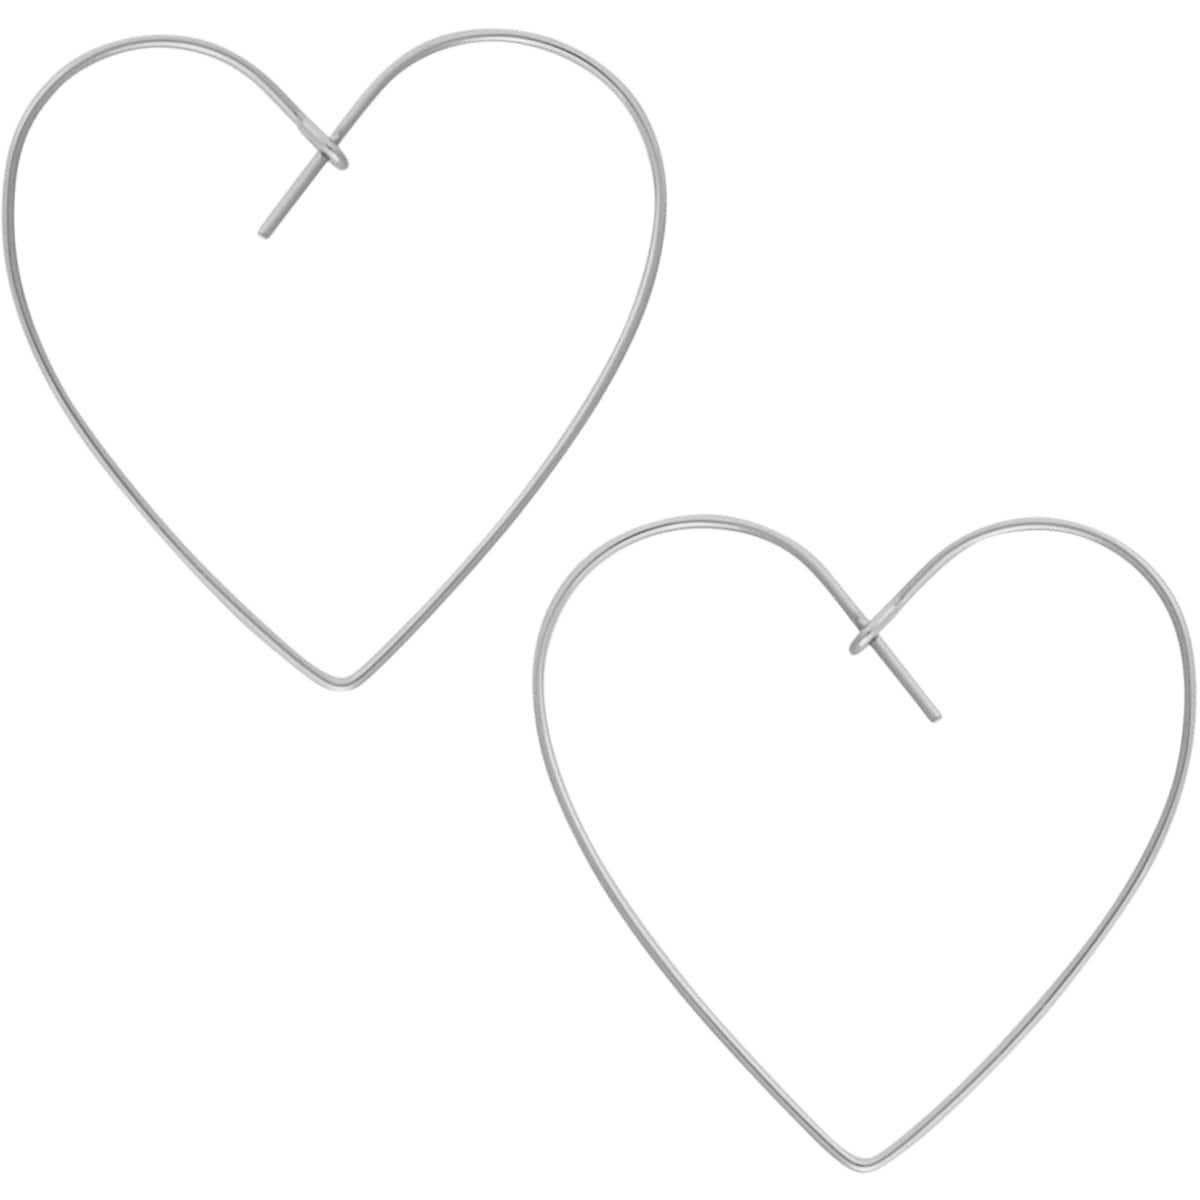 10fdf9d9e22c8 Humble Chic Threader Heart-Shaped Hoop Earrings - Lightweight Open  Geometric Drop Dangles